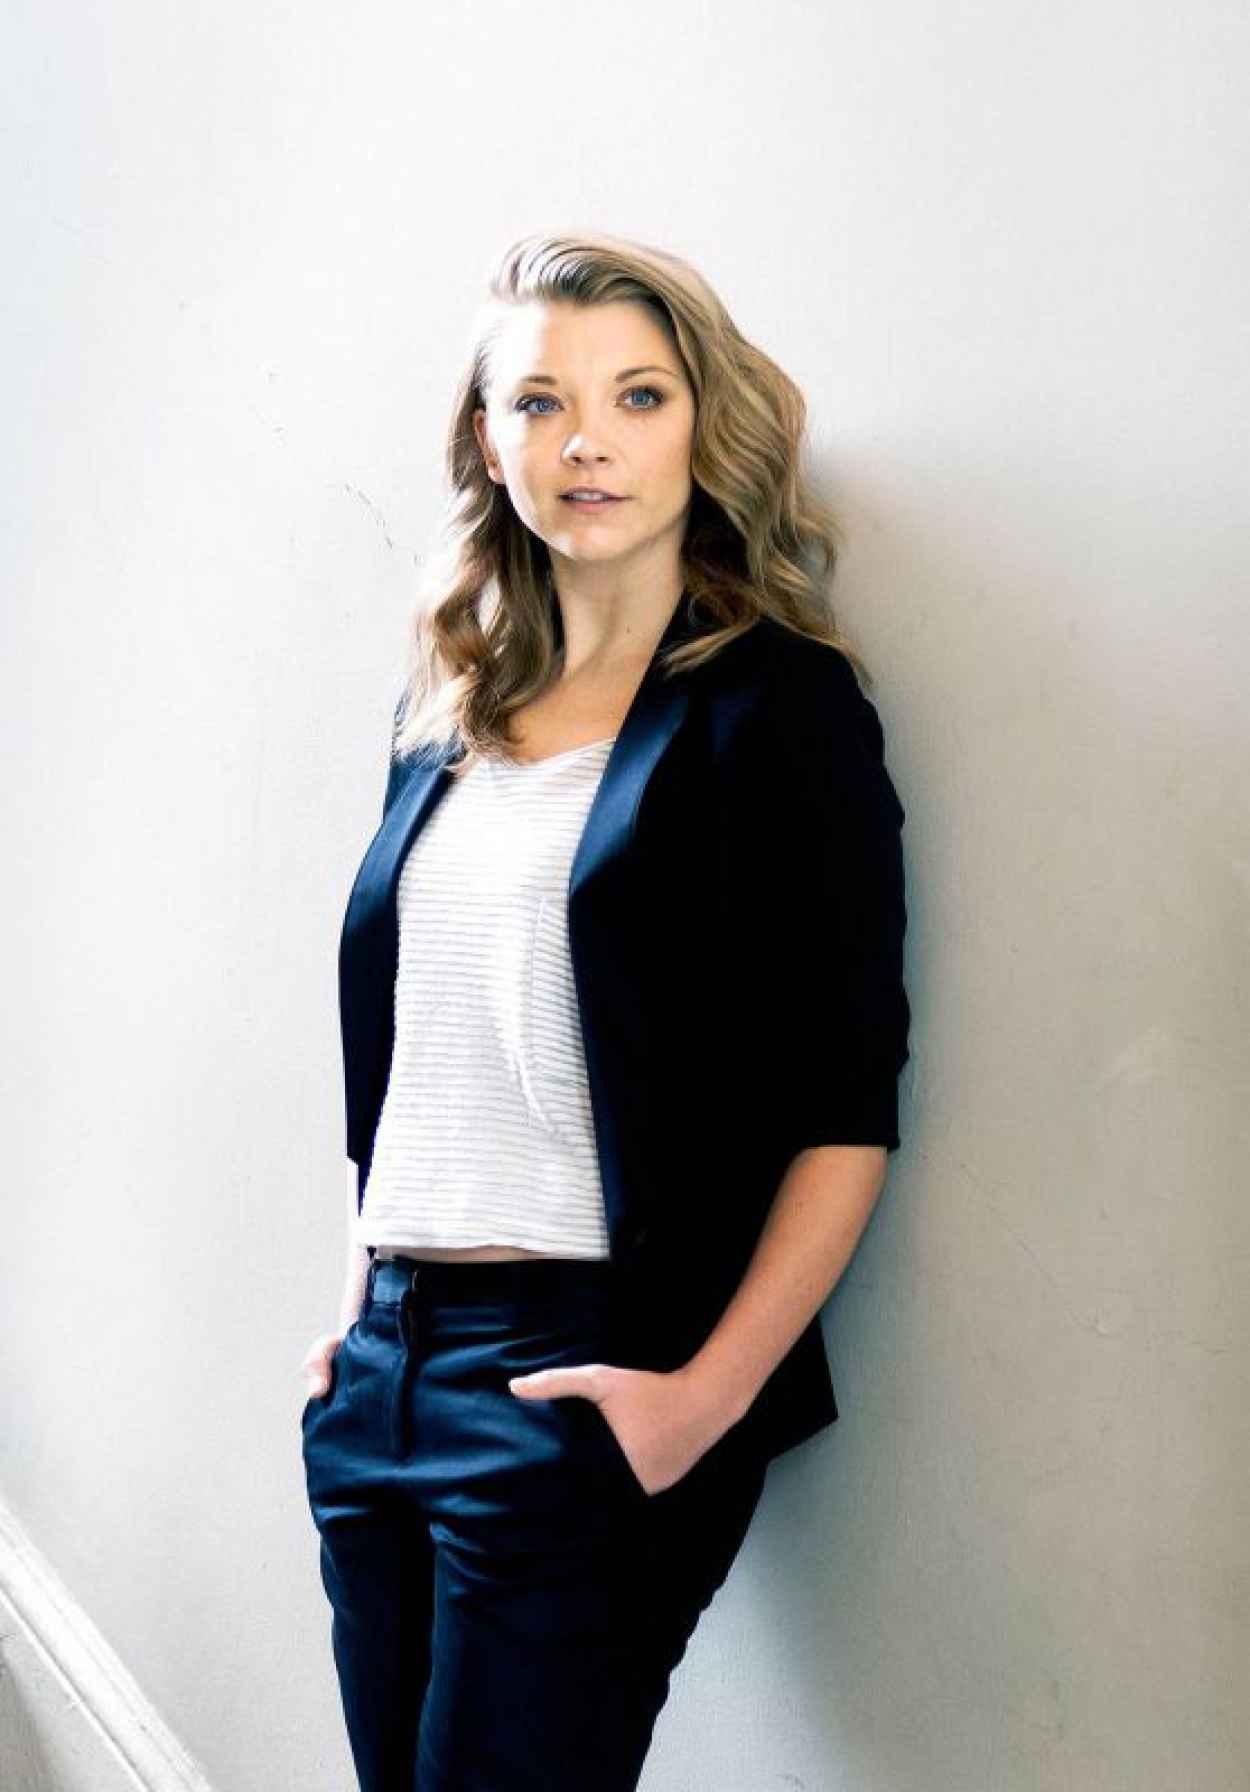 Natalie Dormer Photoshoot - The Telegraph, August 2015-1